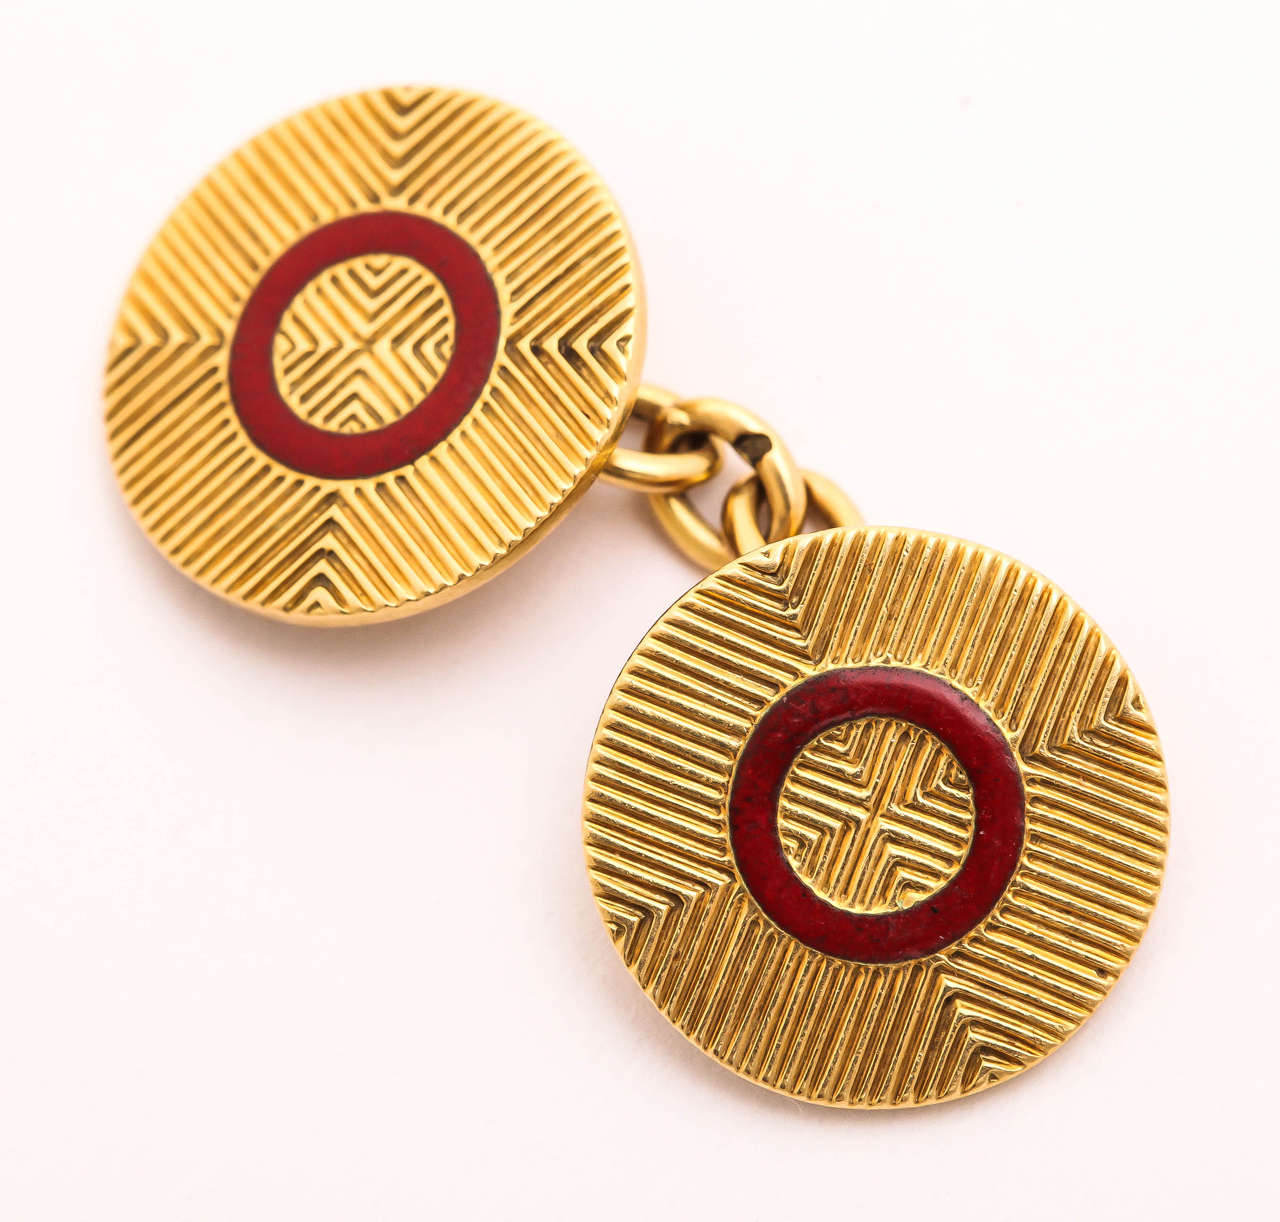 Men's French Art Deco Red Enamel Gold Cufflinks For Sale